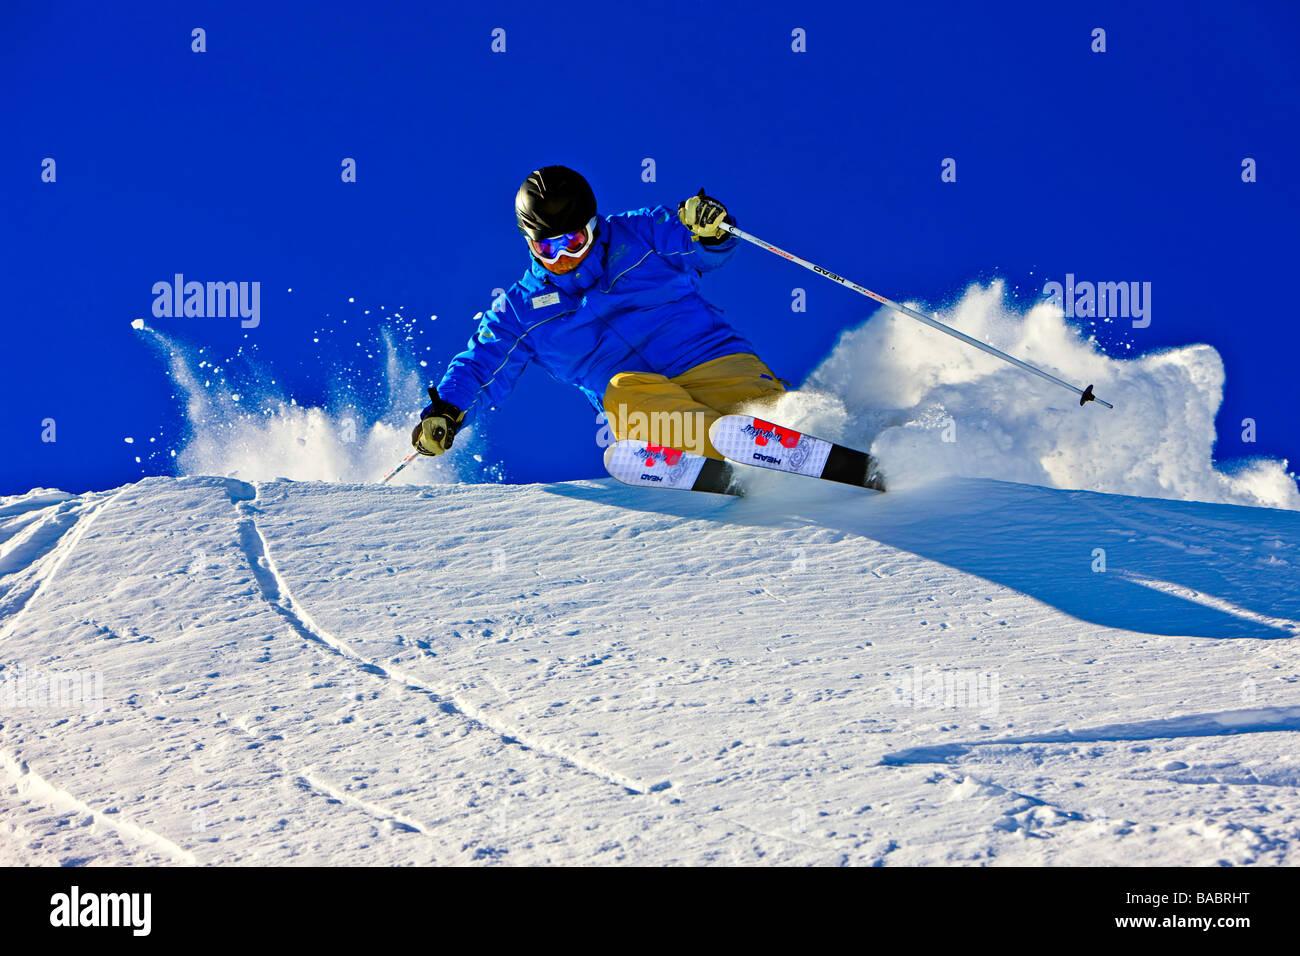 Skier on the upper slopes of Whistler Mountain Whistler Blackcomb Whistler British Columbia Canada - Stock Image